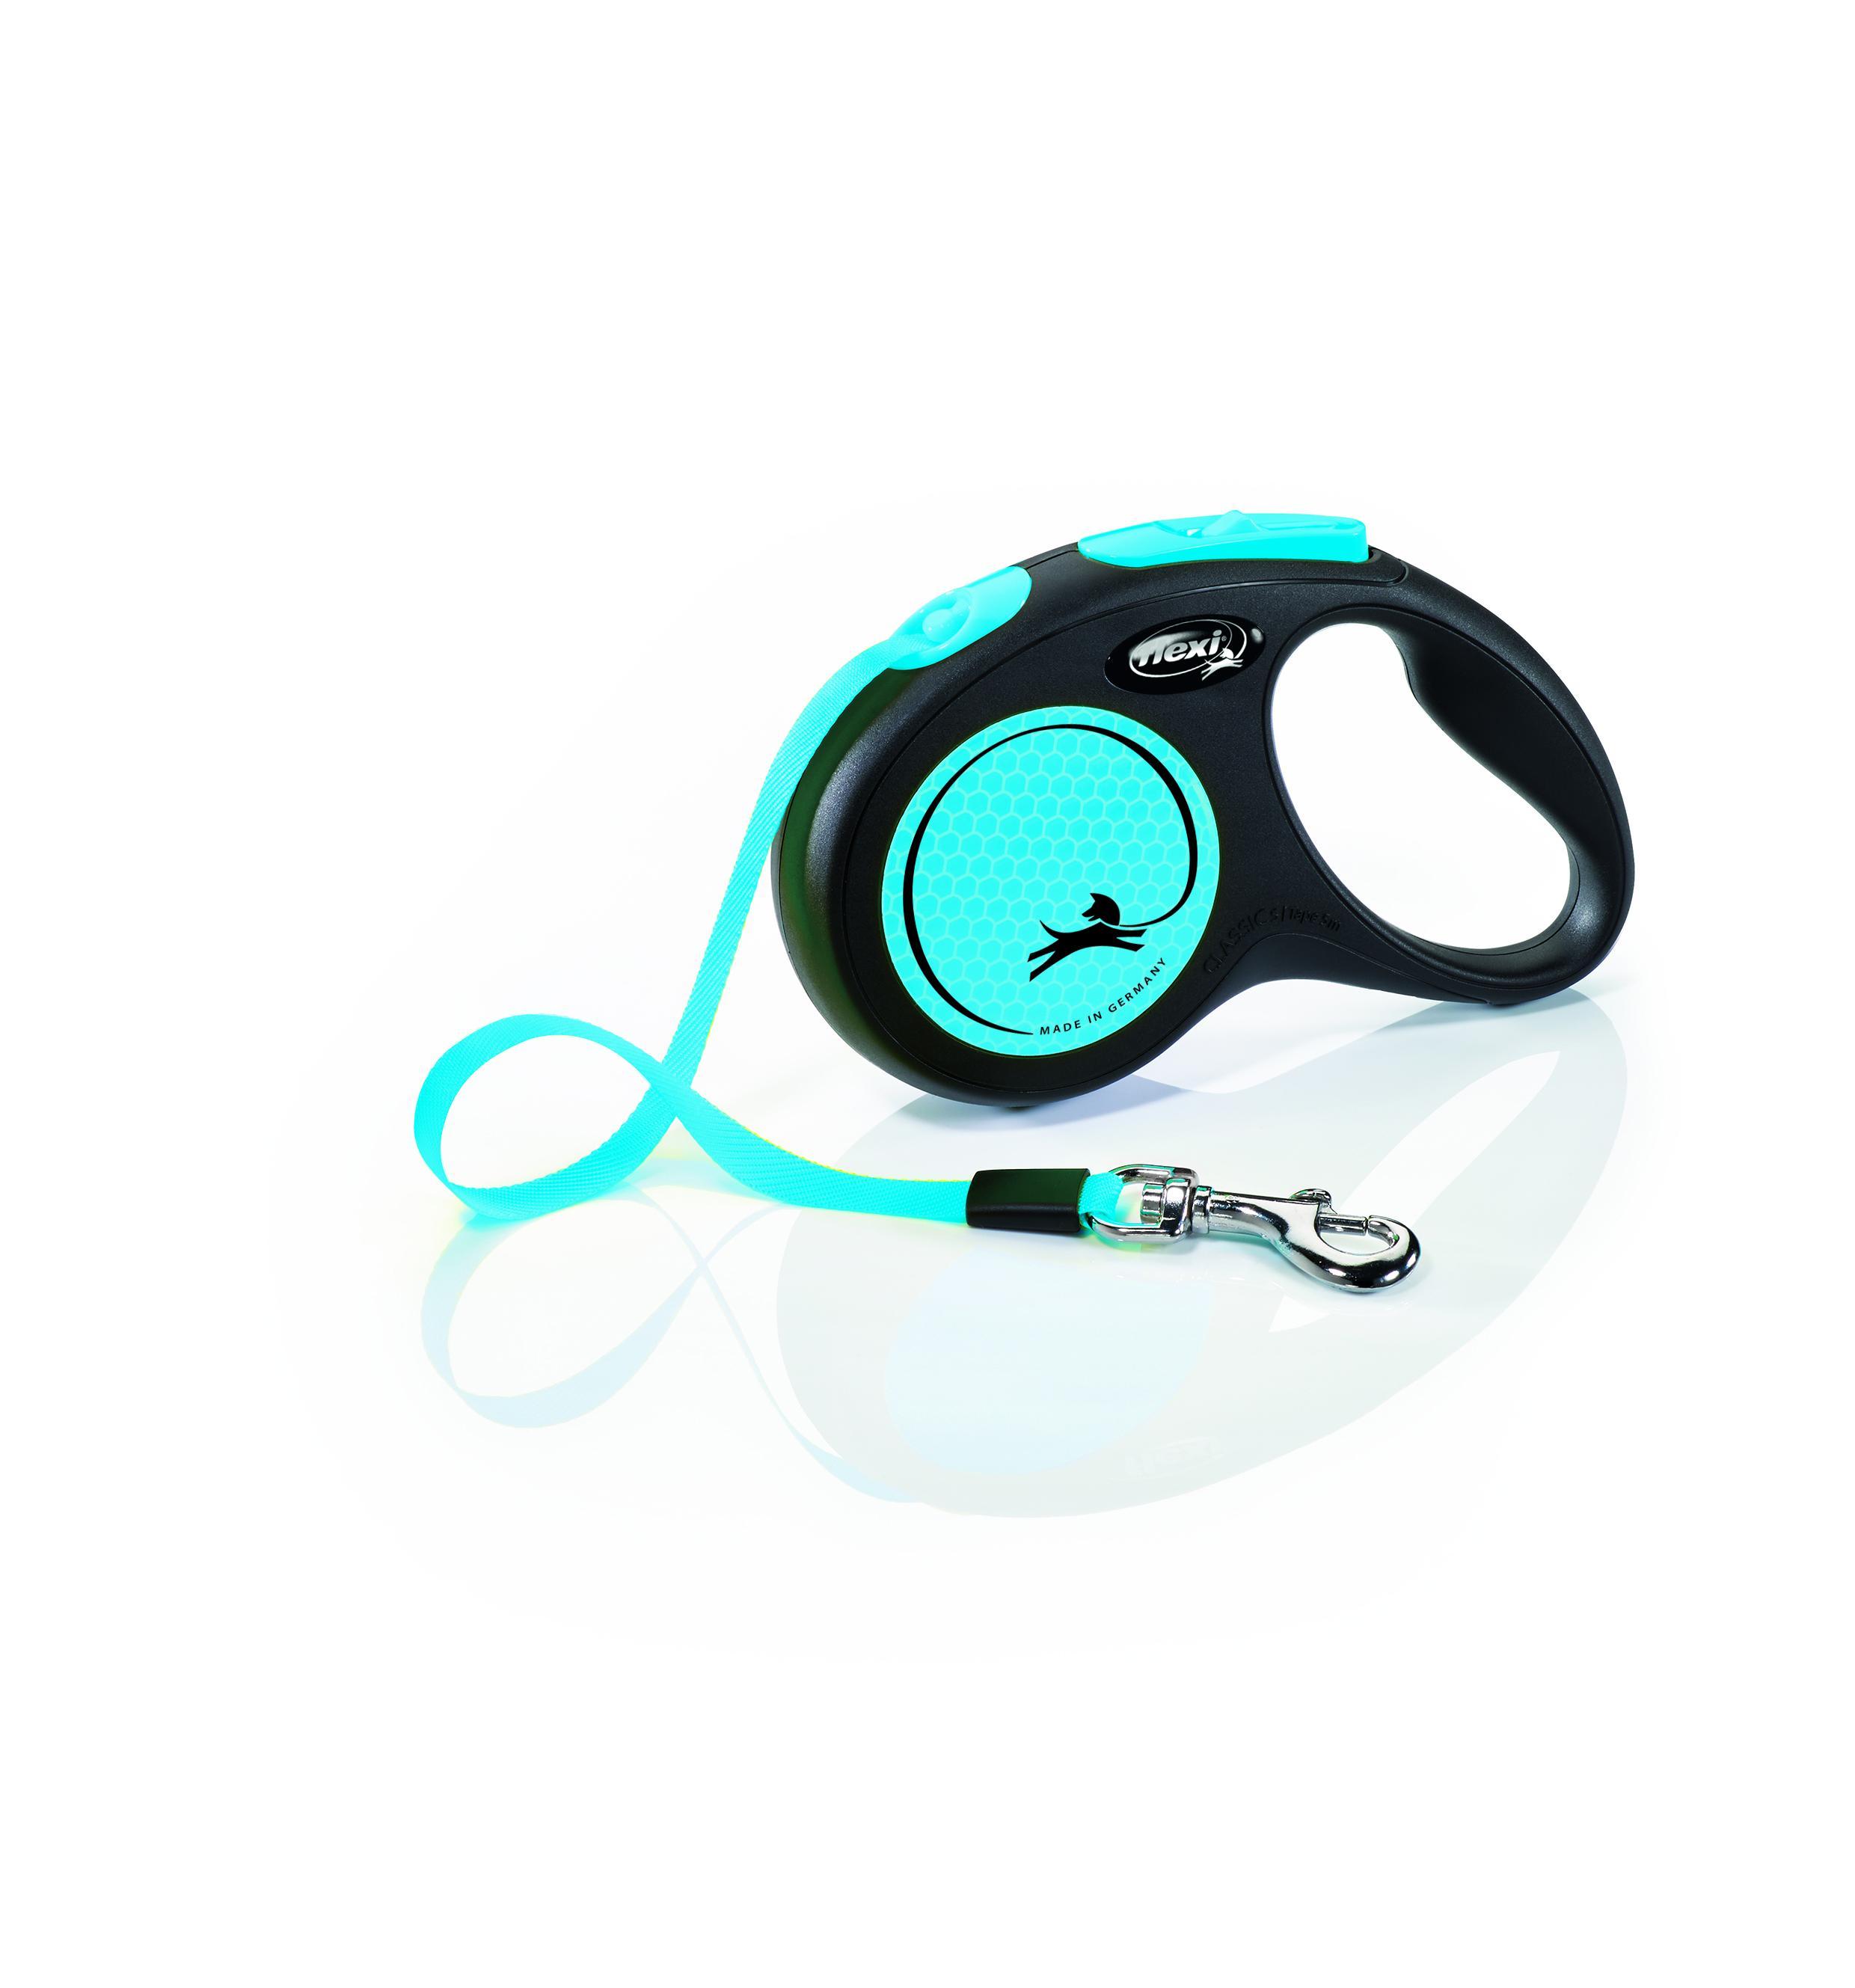 Flexi New Neon Tape Dog Leash, Black/Blue, Small, 16-ft